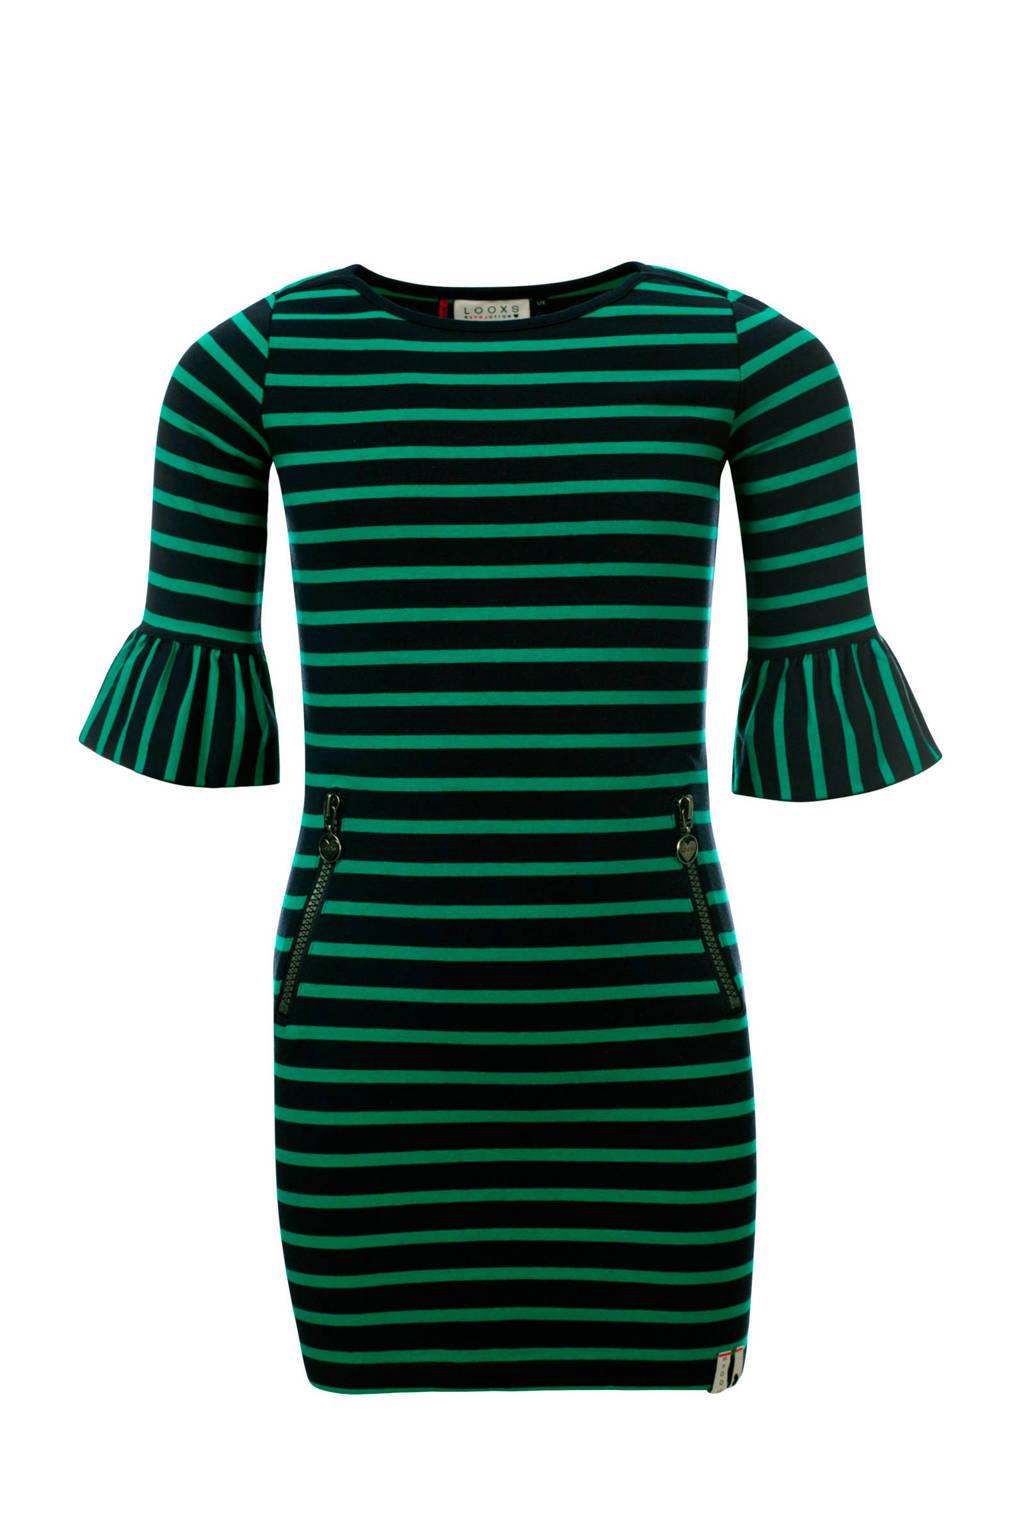 LOOXS gestreepte jurk met trompetmouwen groen, Groen/donkerblauw